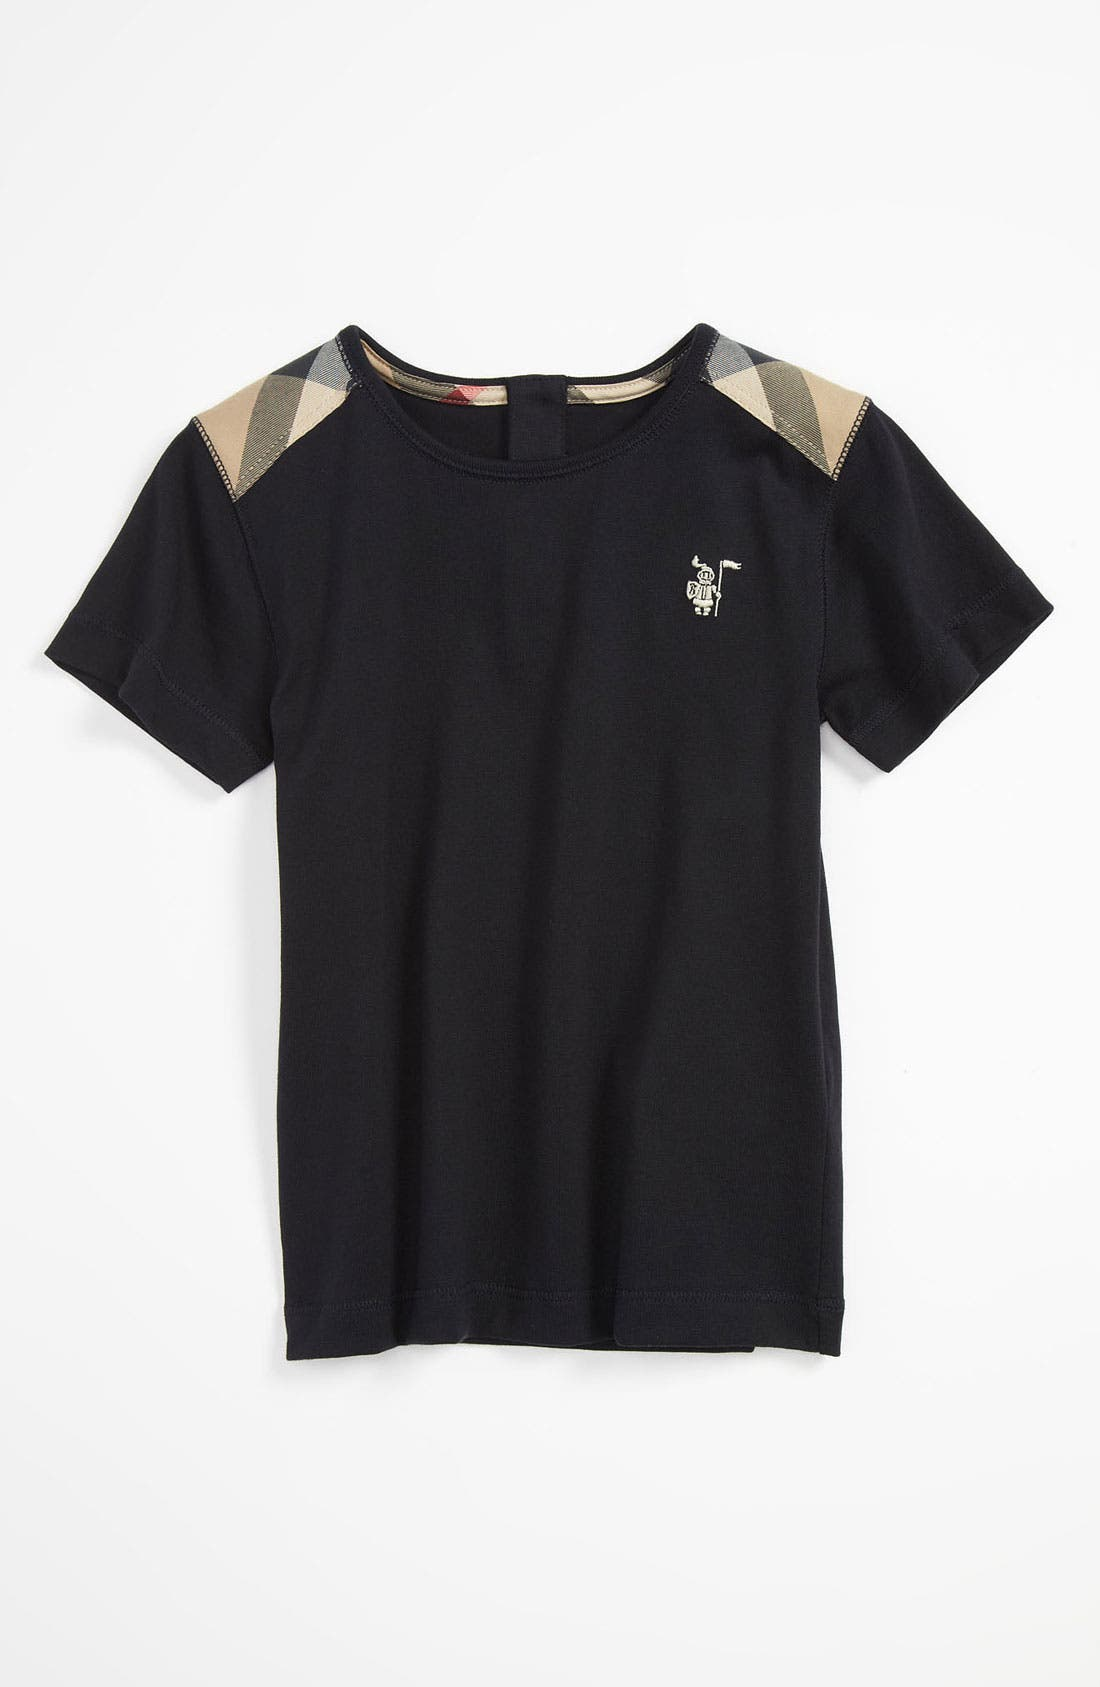 Alternate Image 1 Selected - Burberry Shoulder Patch T-Shirt (Toddler)